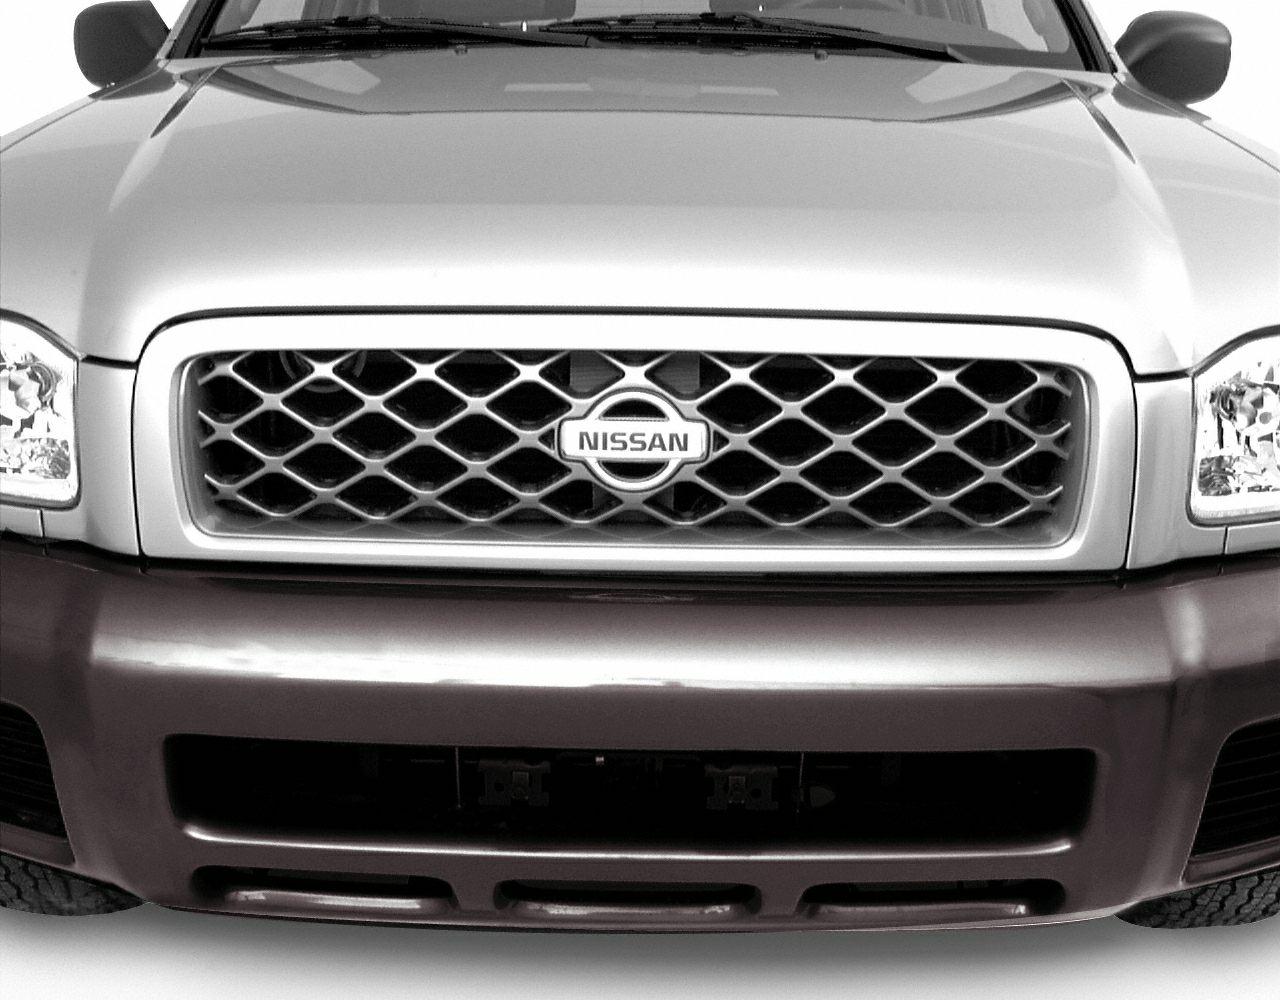 2000 Nissan Pathfinder Se 4dr 4x4 Pictures